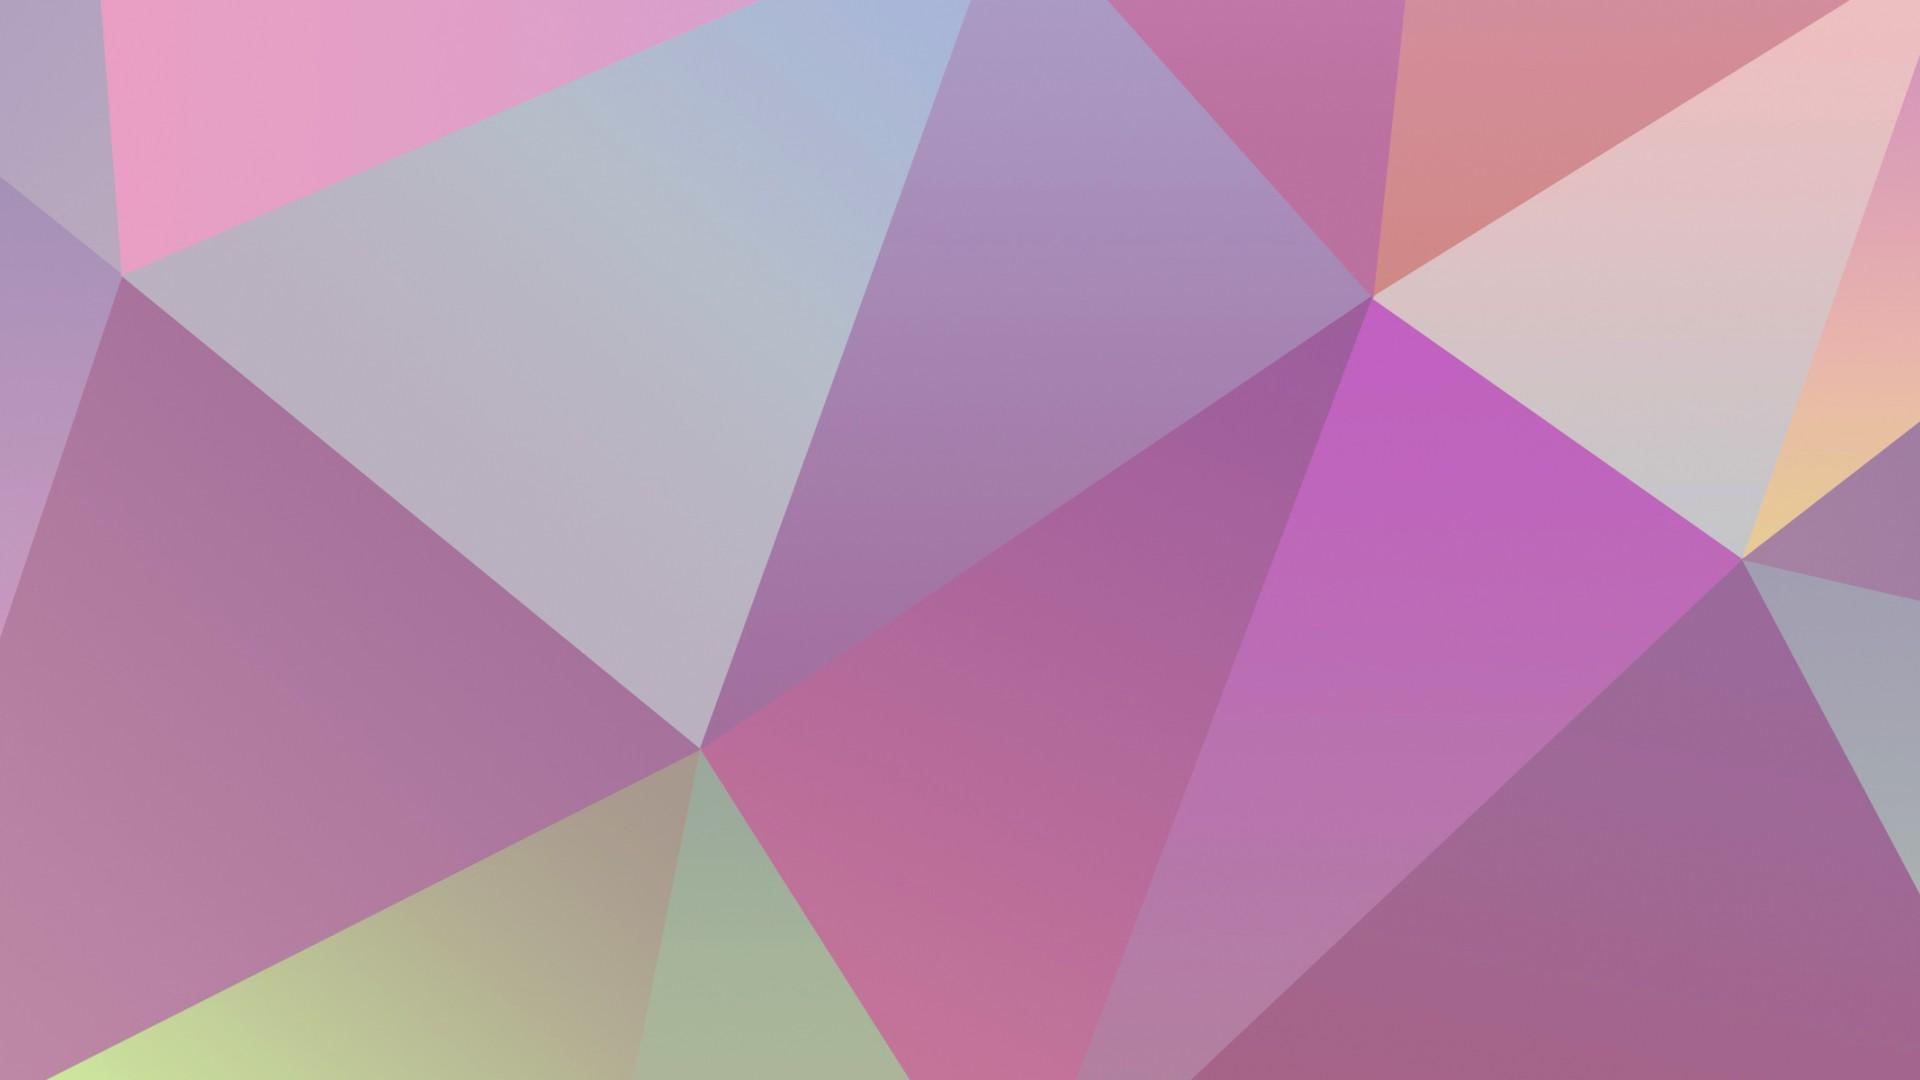 Фон вектор геометрия